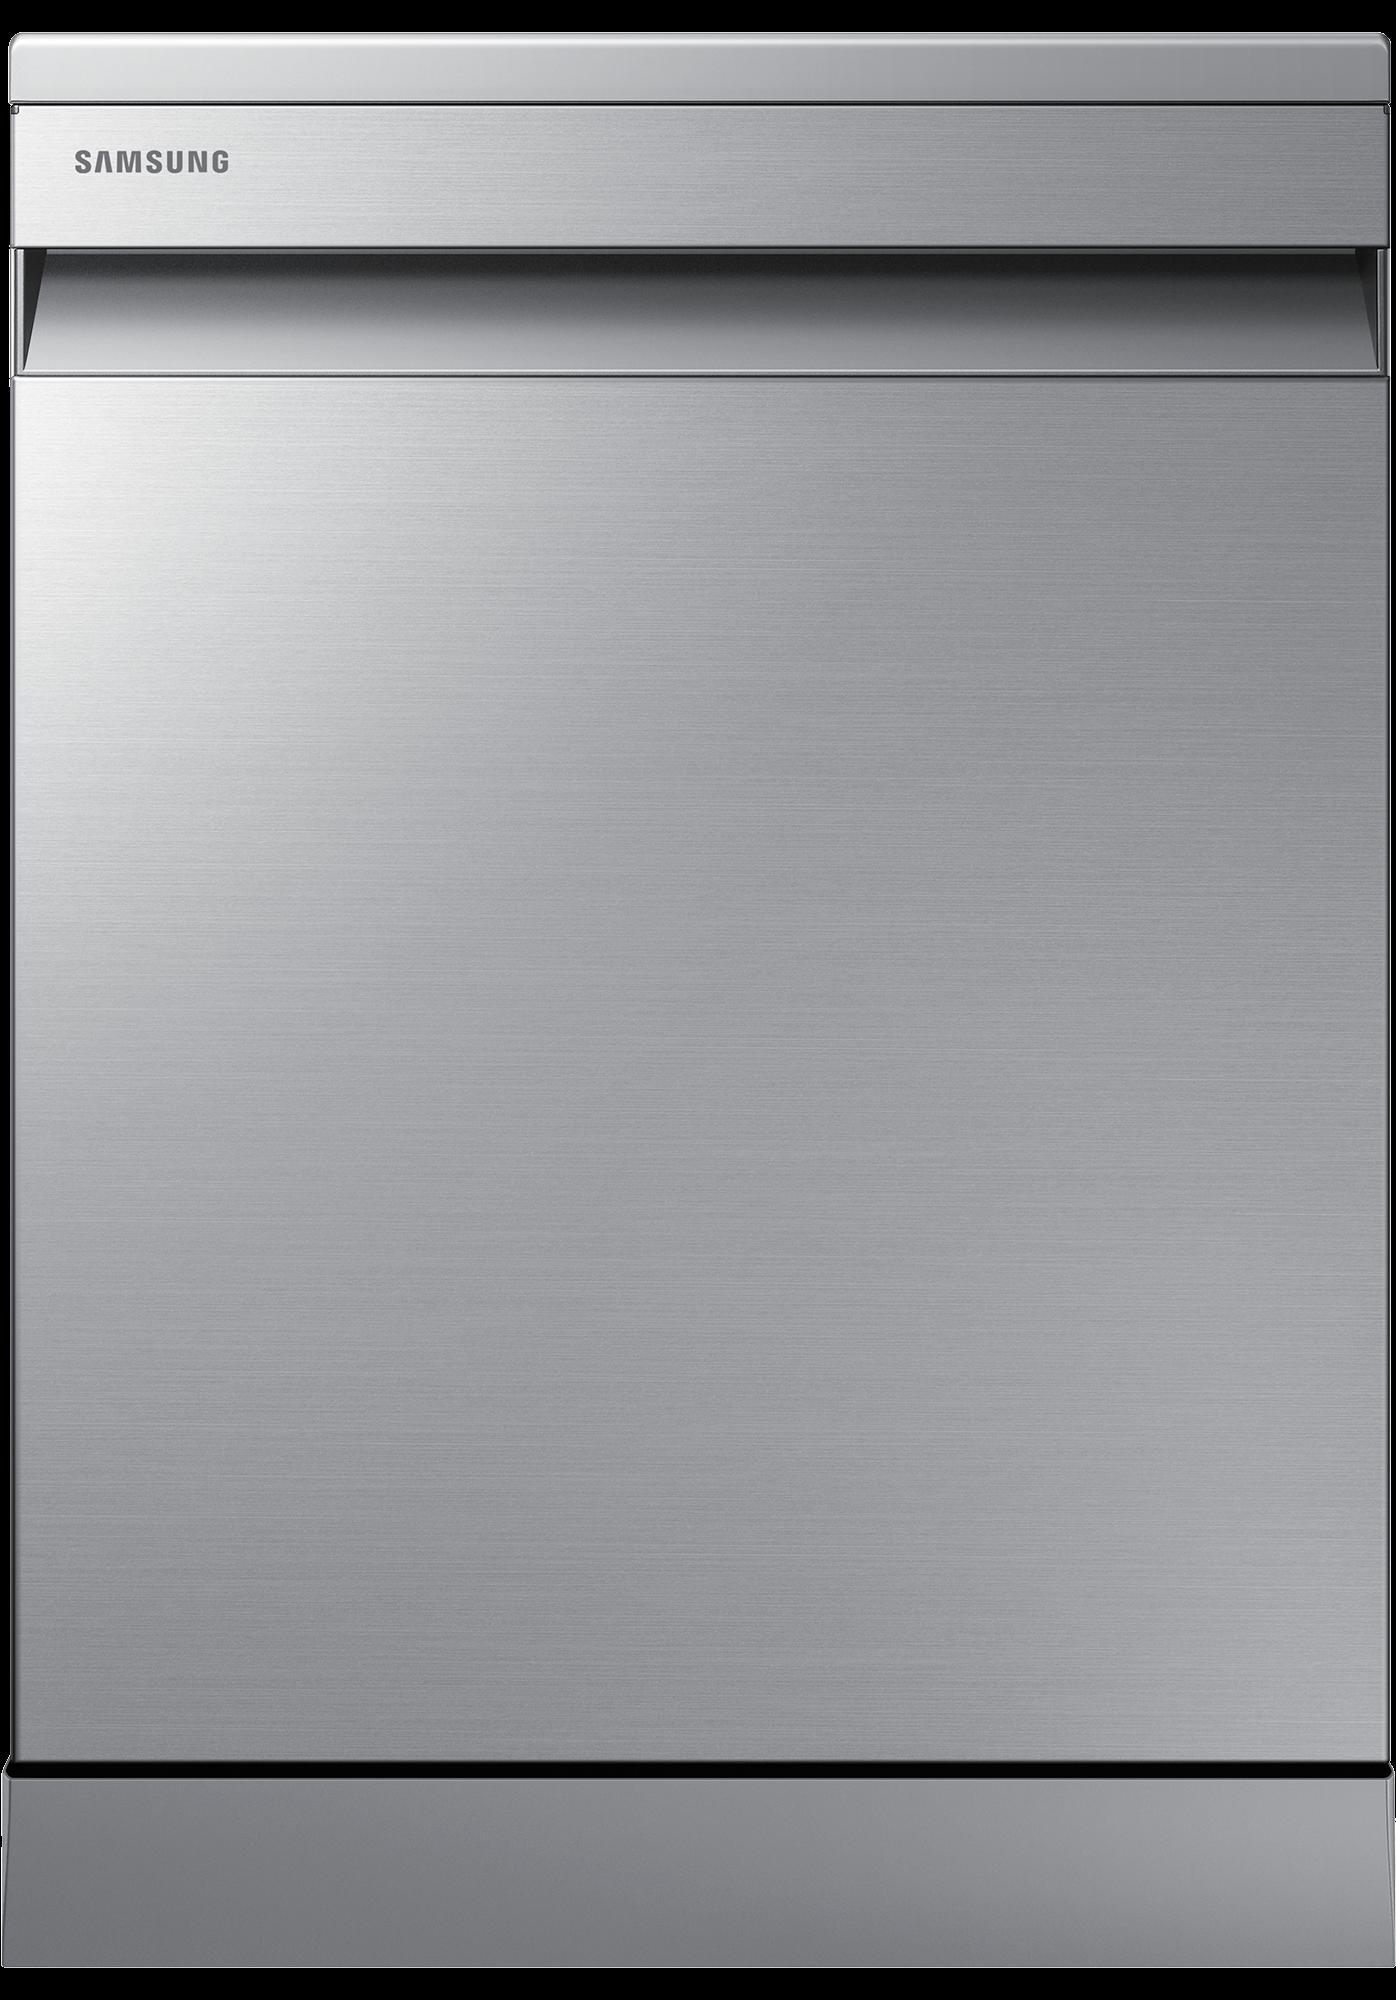 Samsung Freestanding Full Size Dishwasher 13 Place Settings